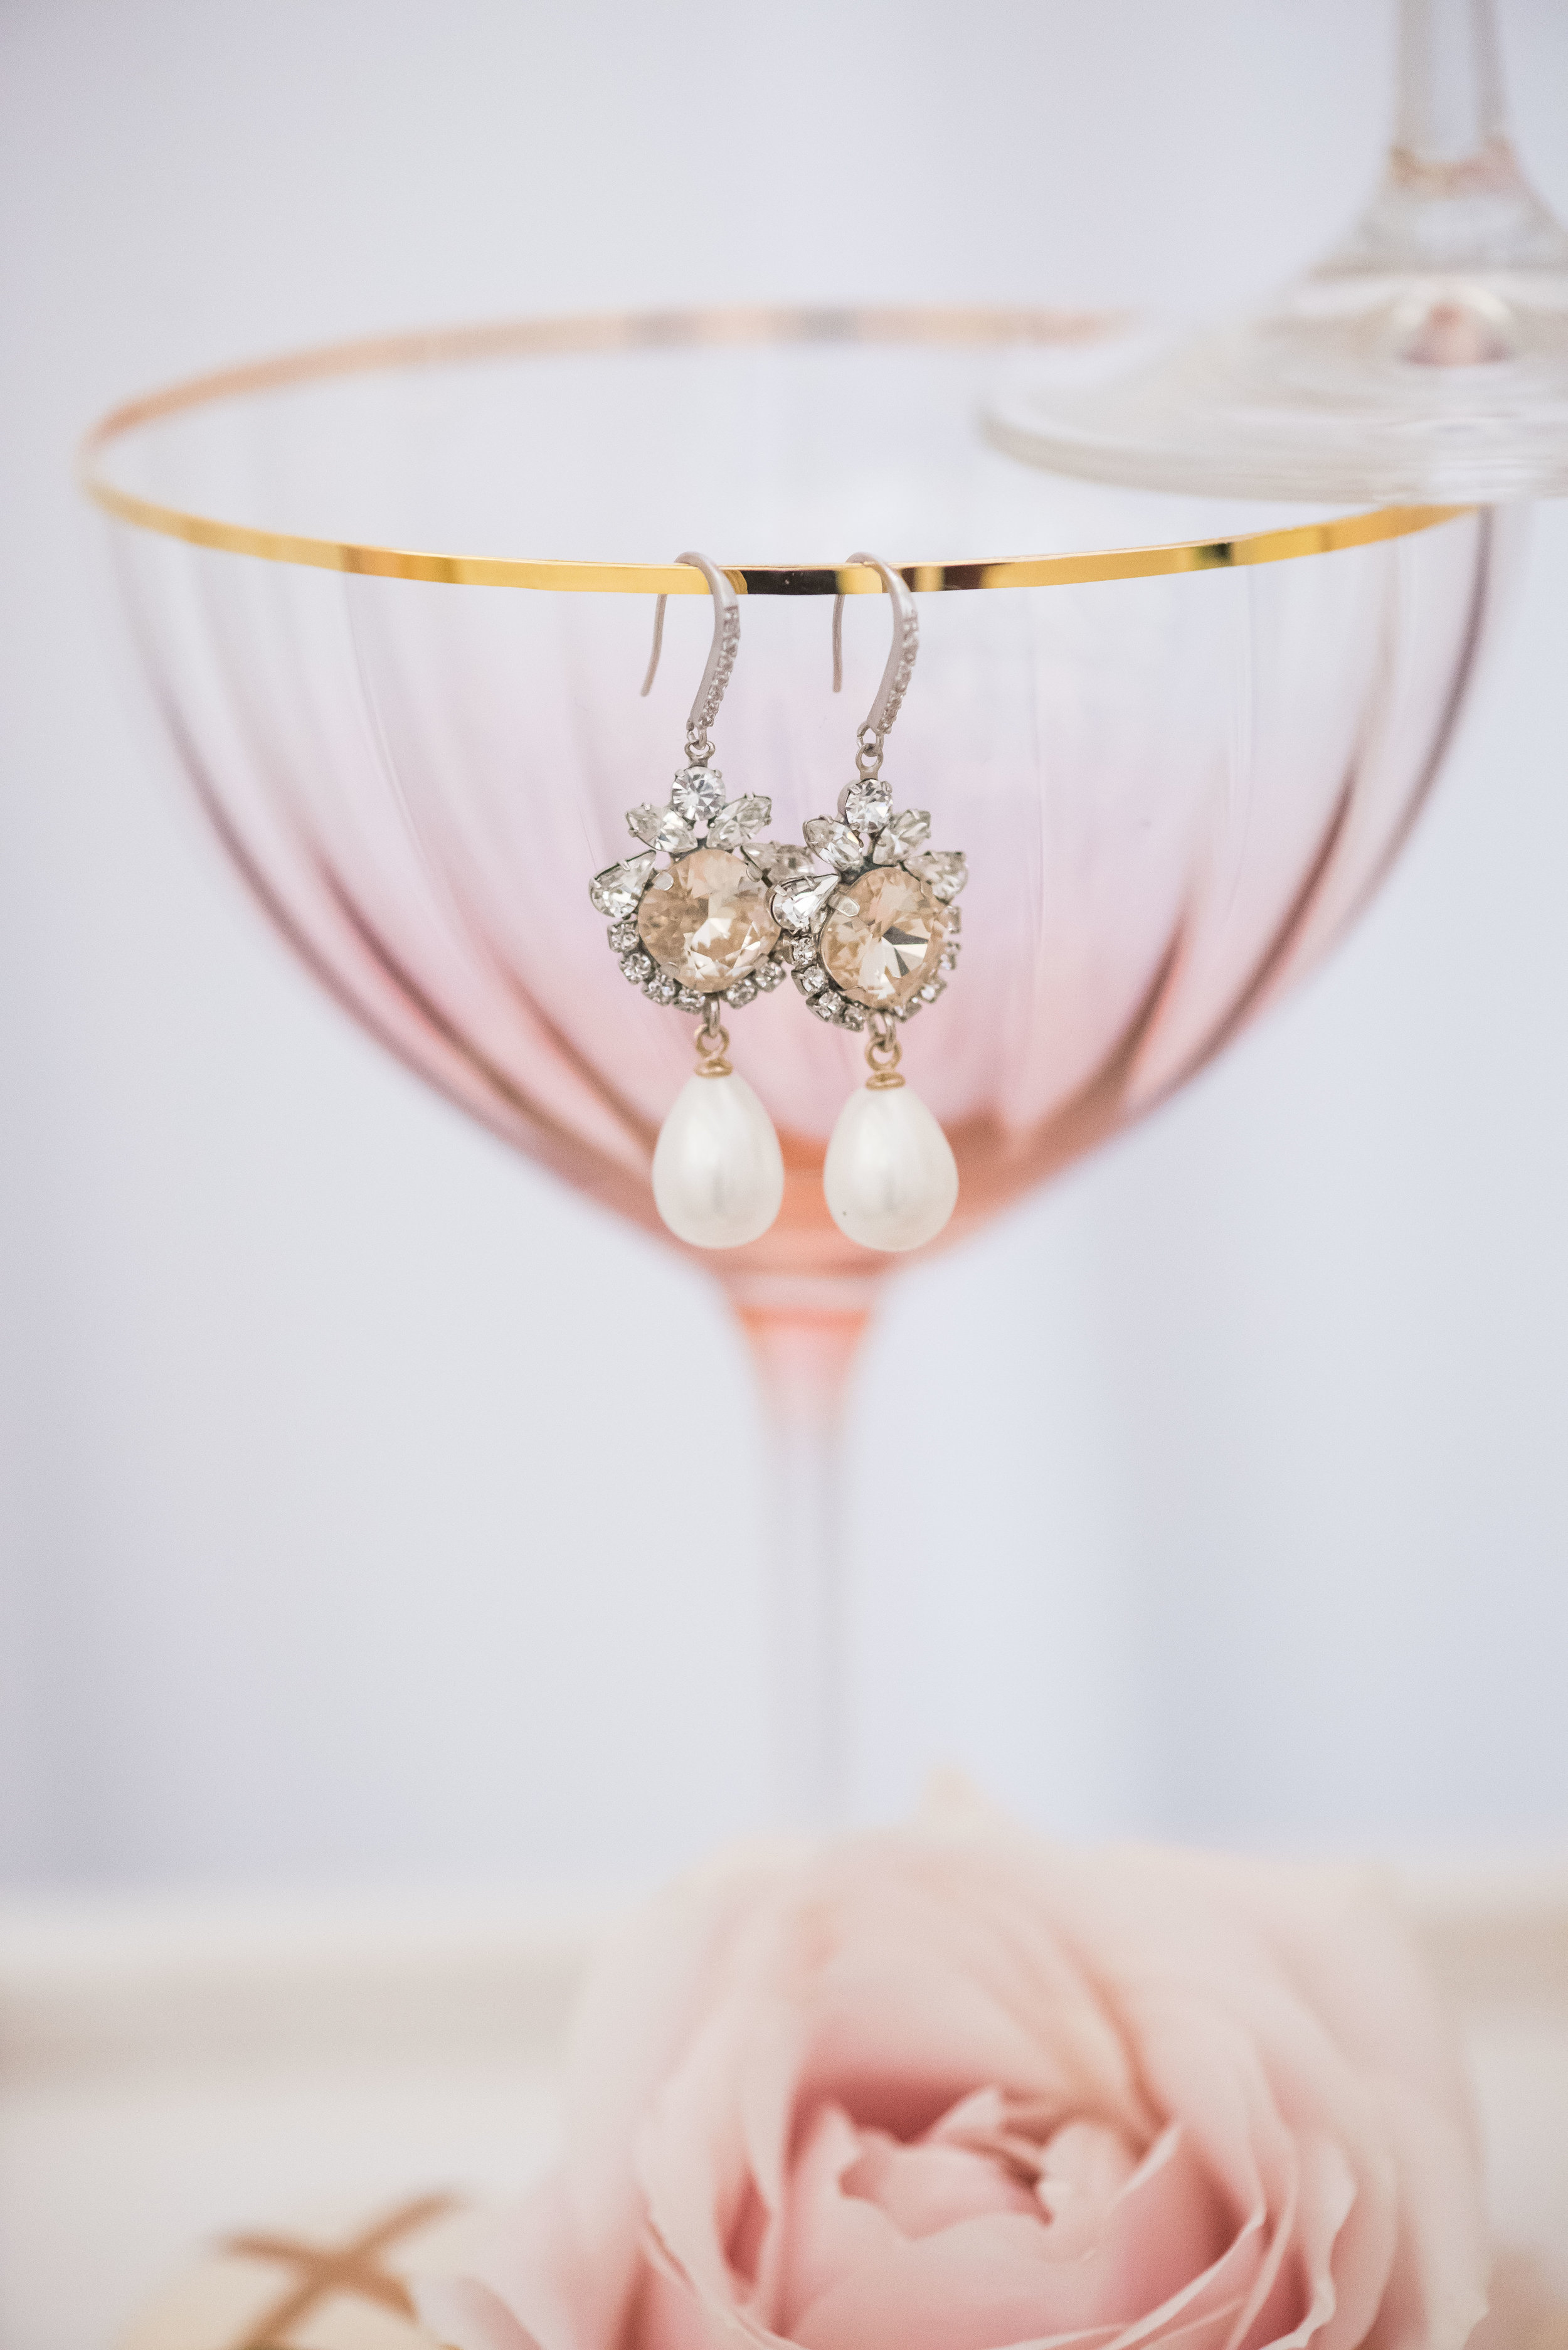 Vancouver Wedding Jewelry, Elsa Corsi